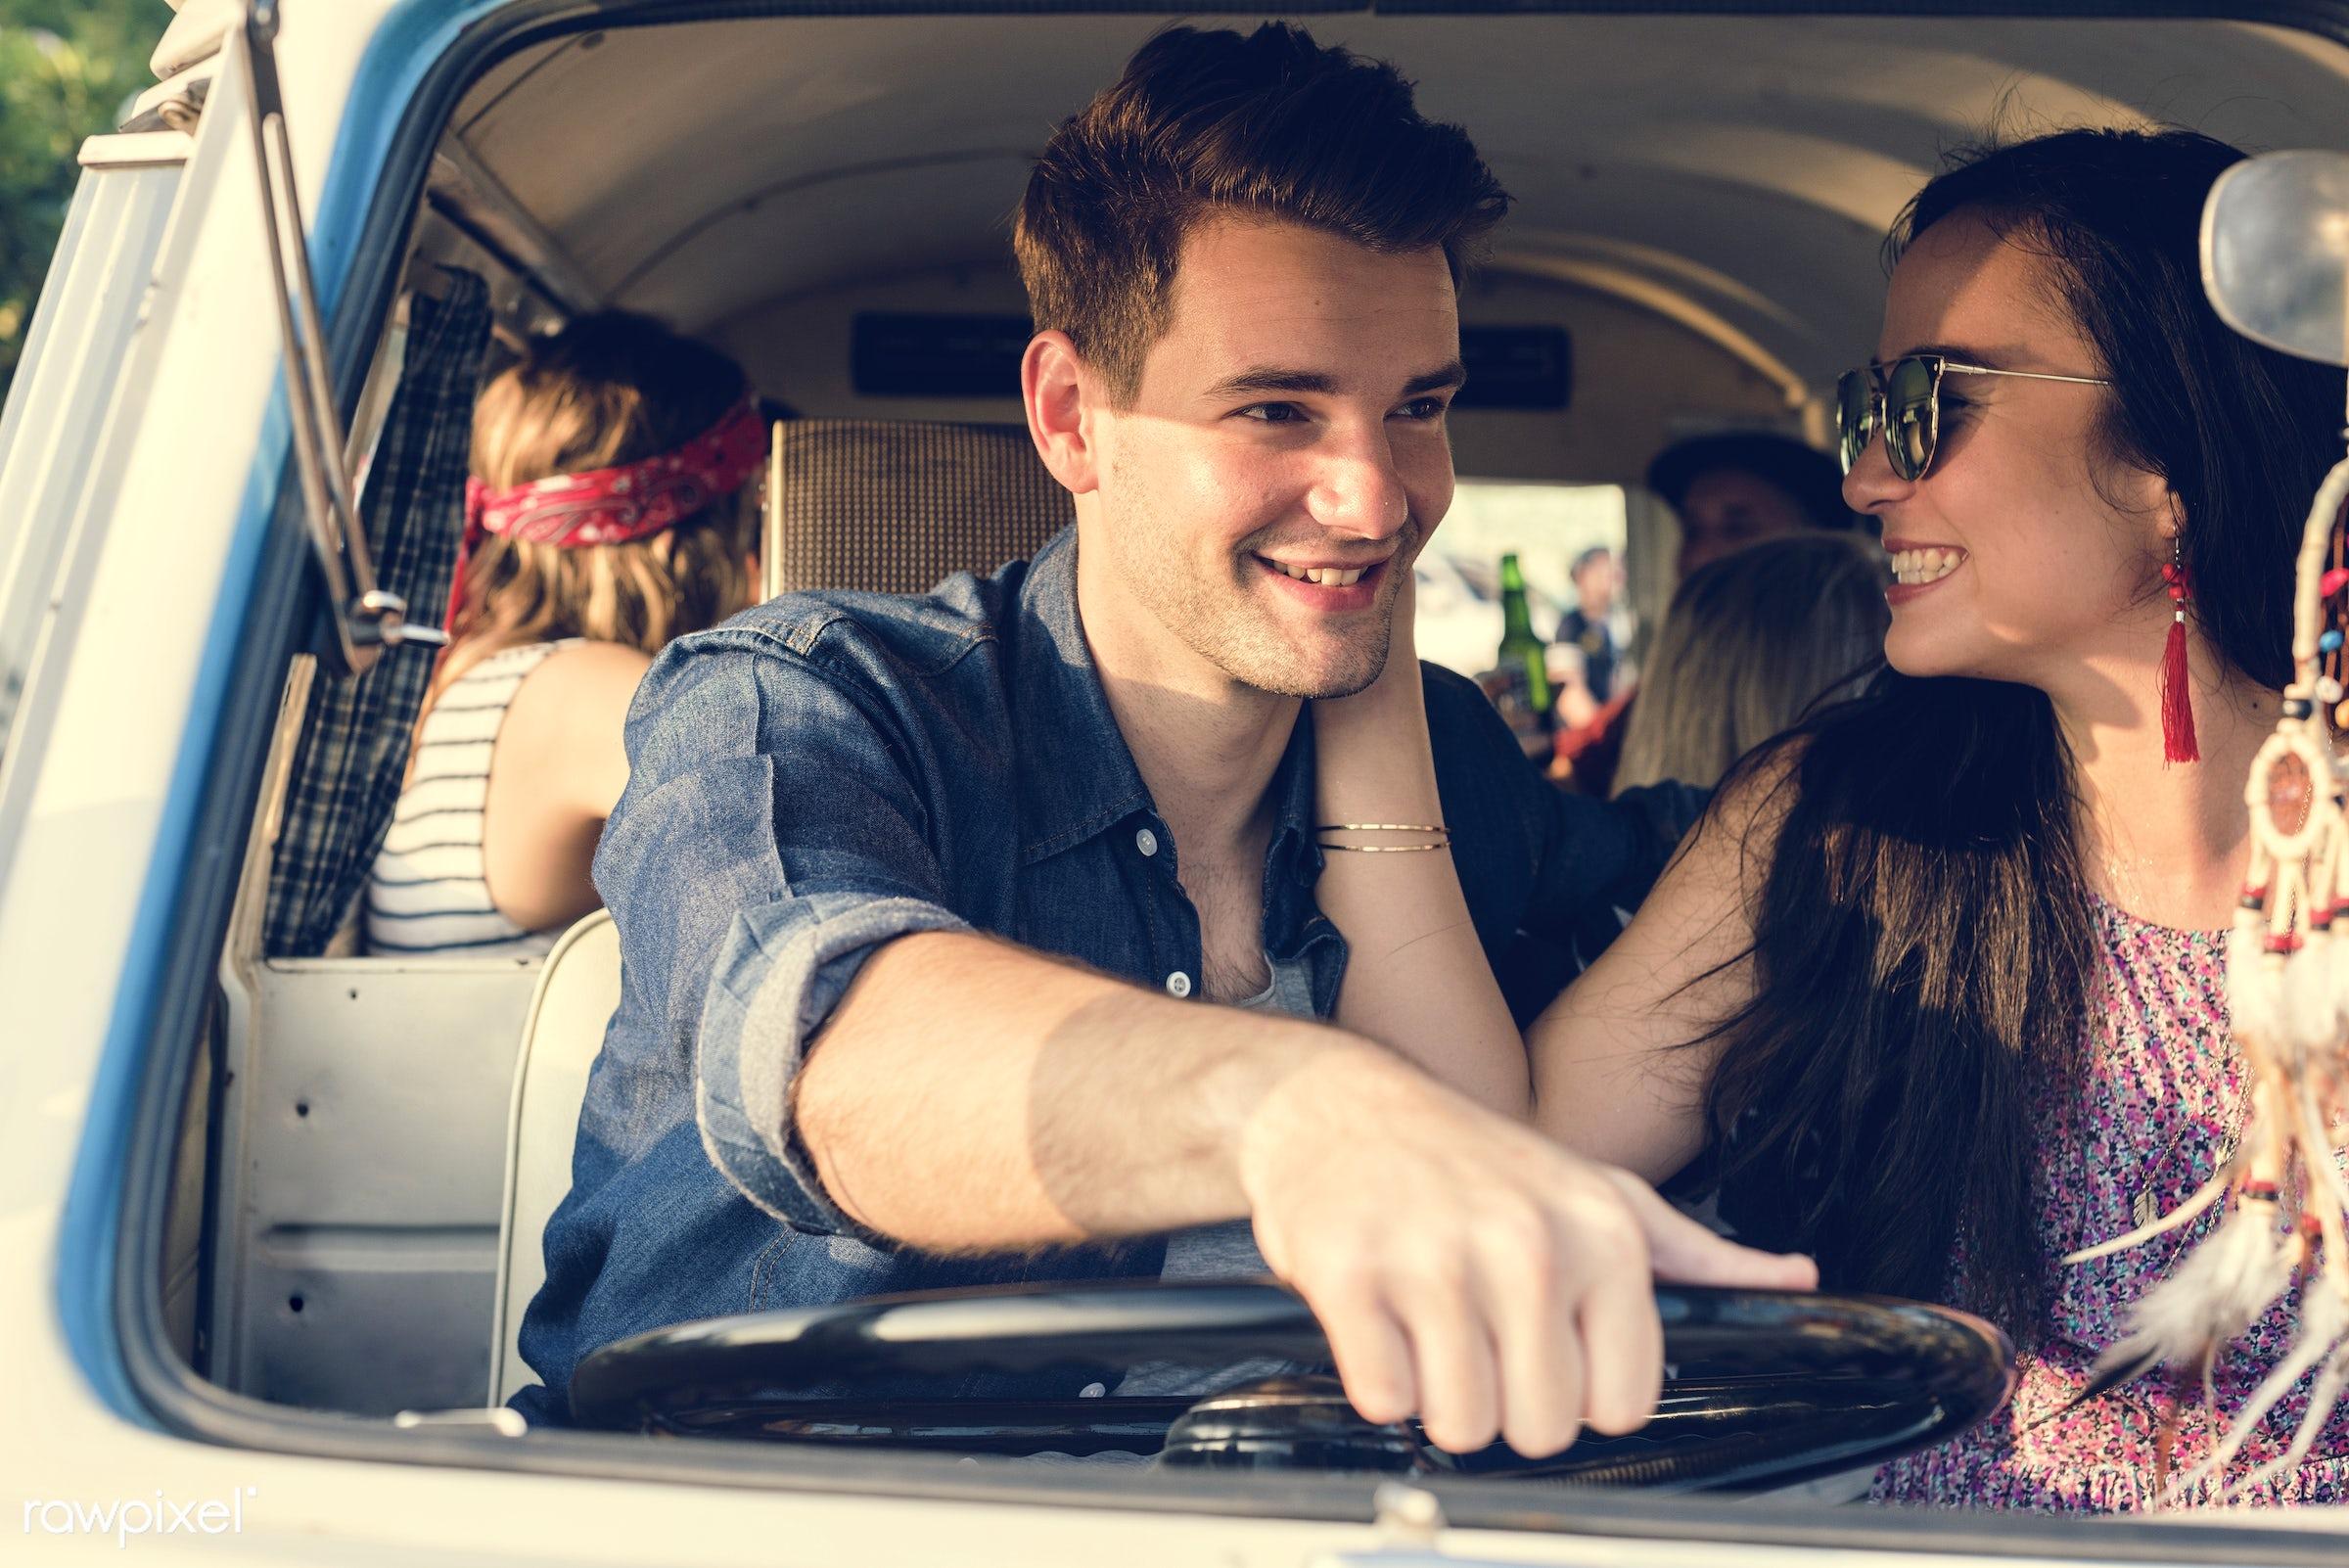 adult, adventure, attractive, car, couple, drive, driving, happiness, happy, journey, joyful, leisure, life, lifestyle, love...